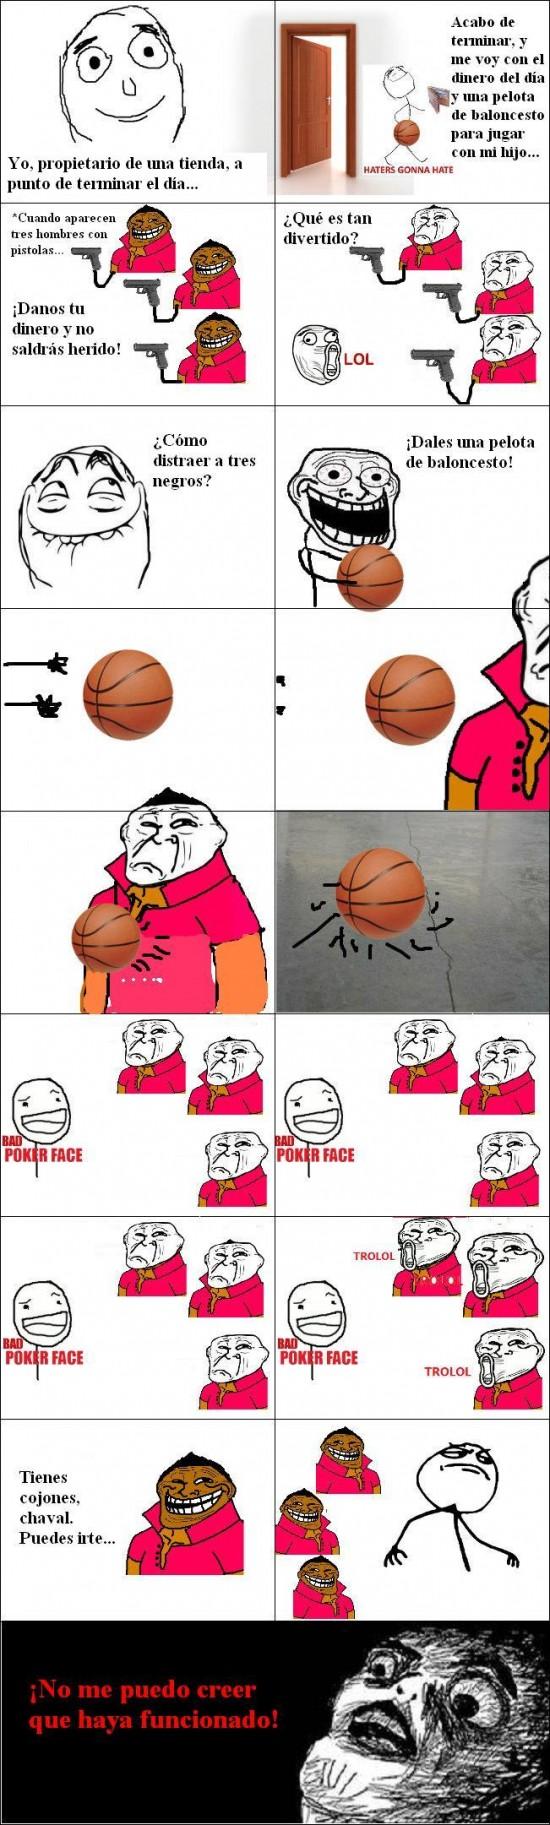 atraco,Baloncesto,dinero,negro,pelota,S18